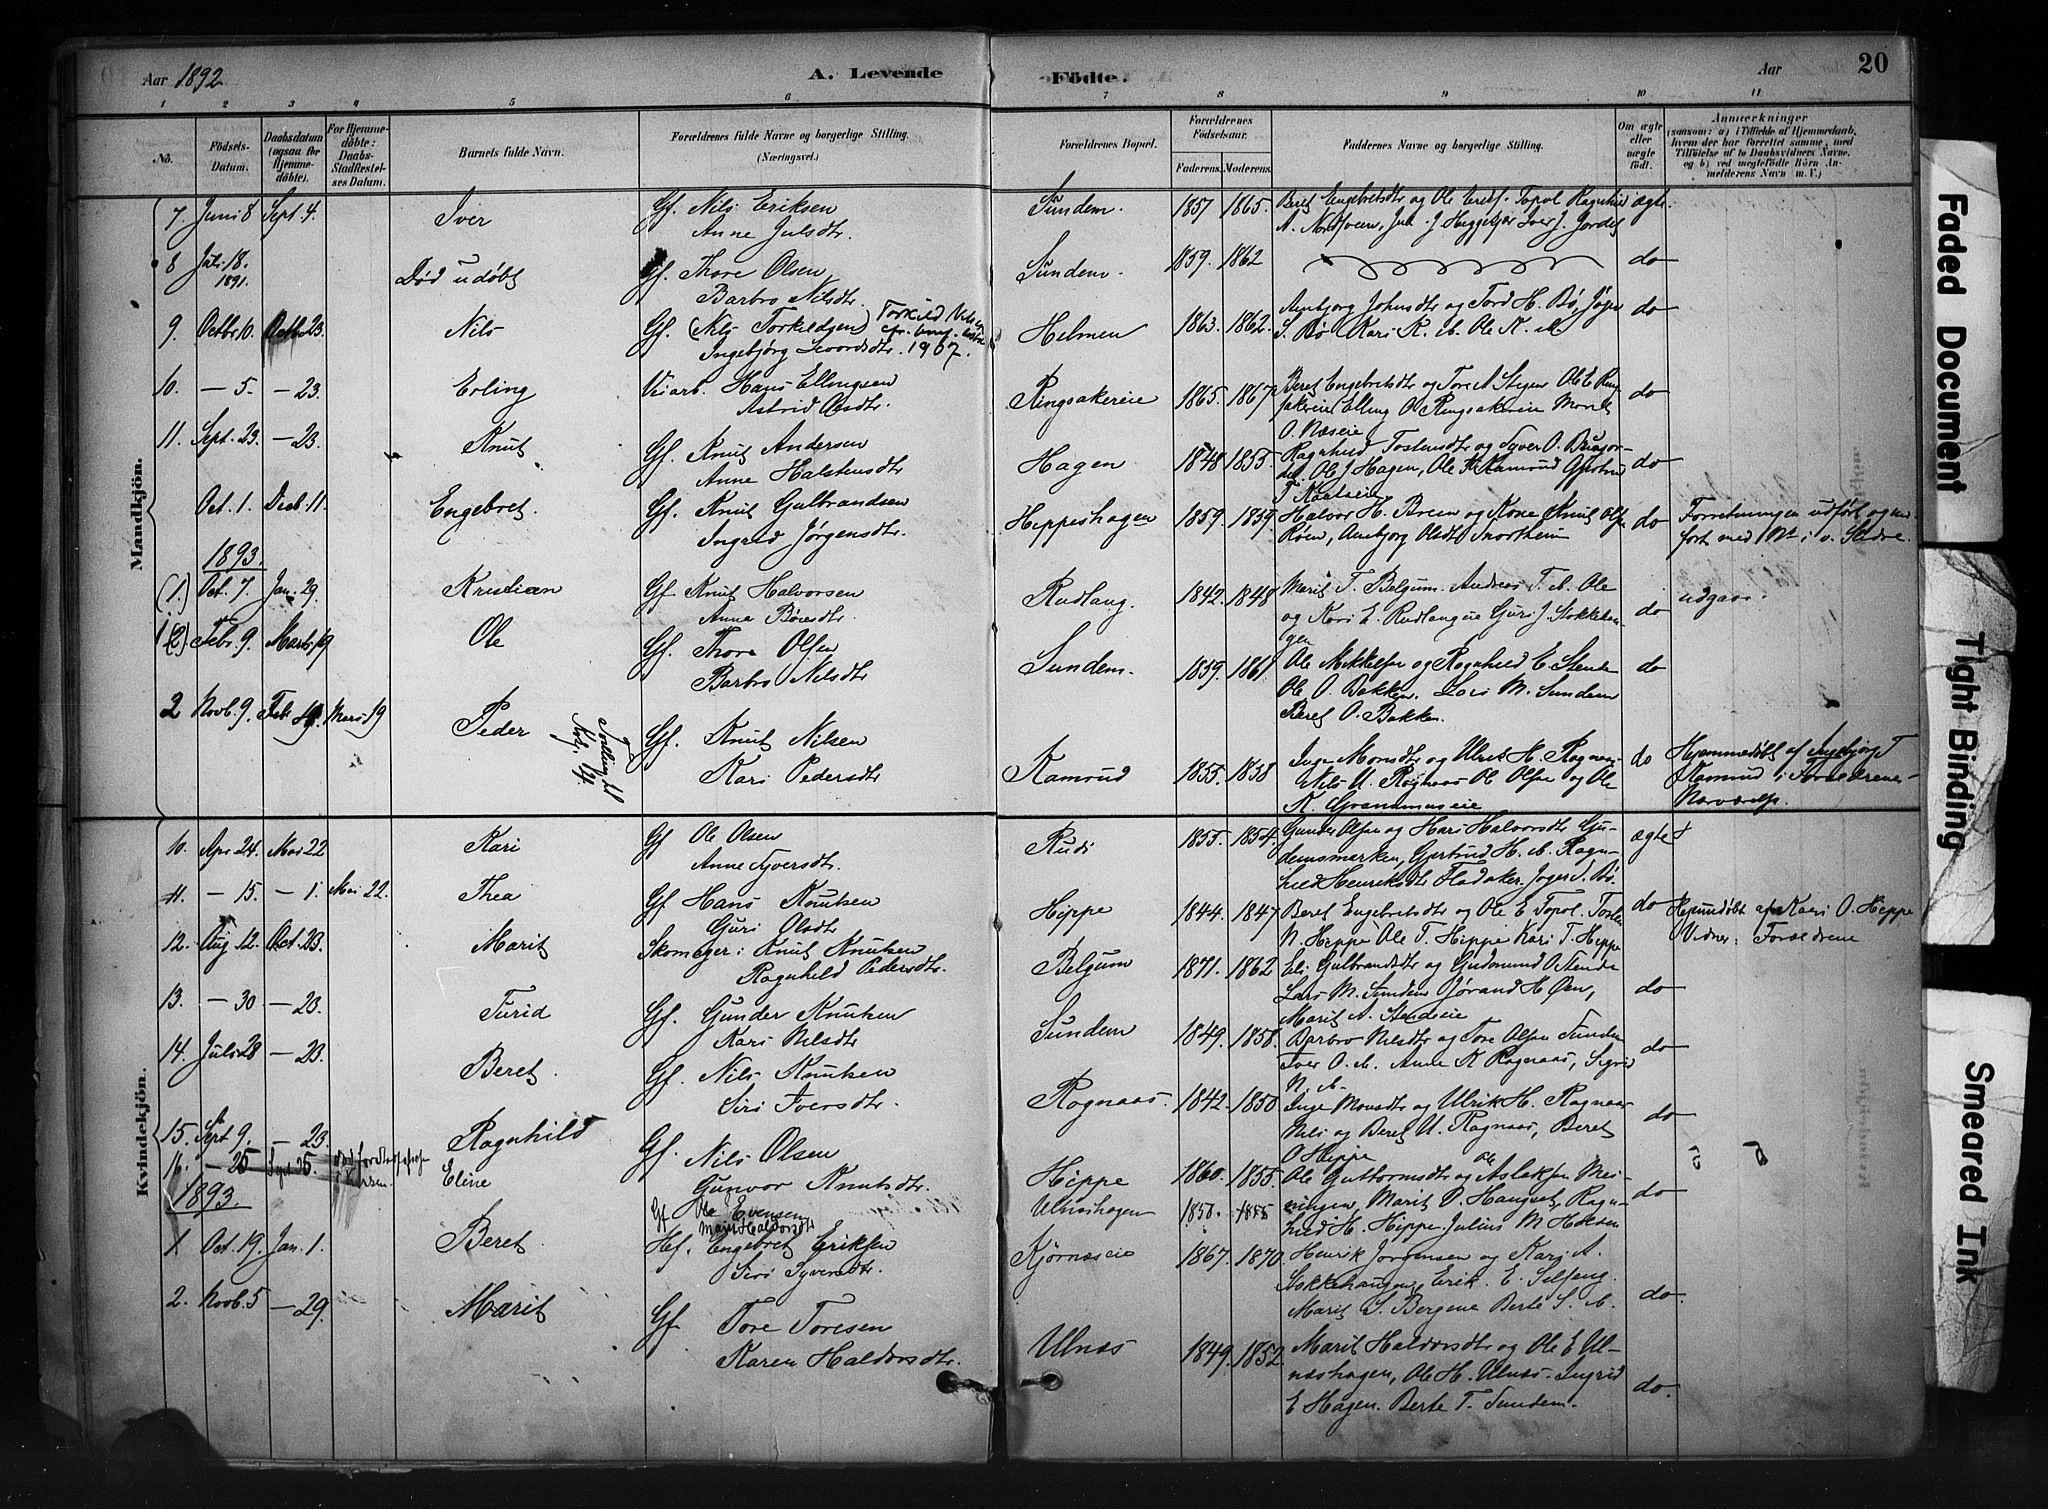 SAH, Nord-Aurdal prestekontor, Ministerialbok nr. 11, 1883-1896, s. 20